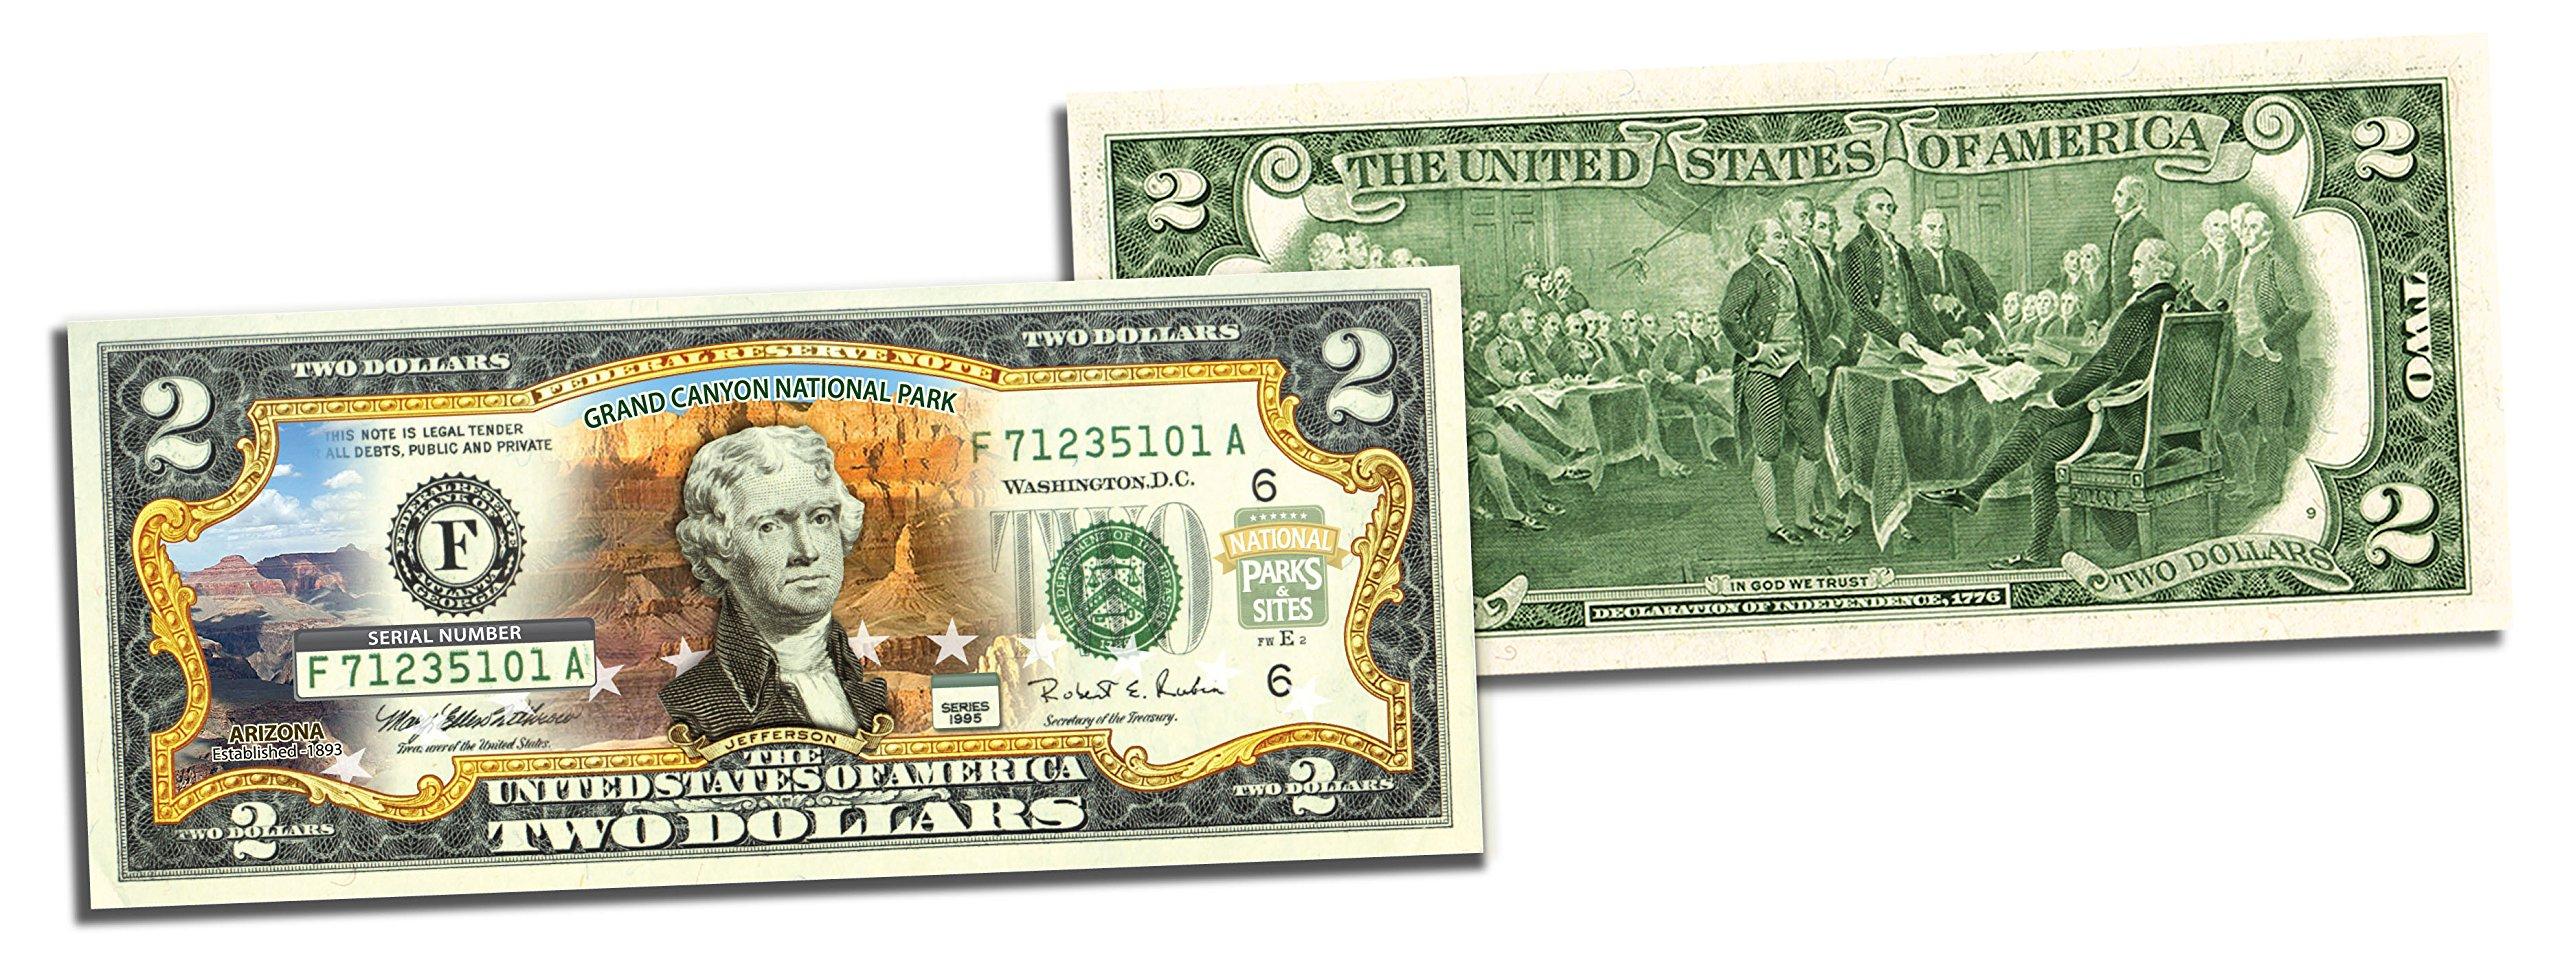 5 Consecutive Serial Number GRAND CANYON NATIONAL PARK $2 Bills US Legal Tender